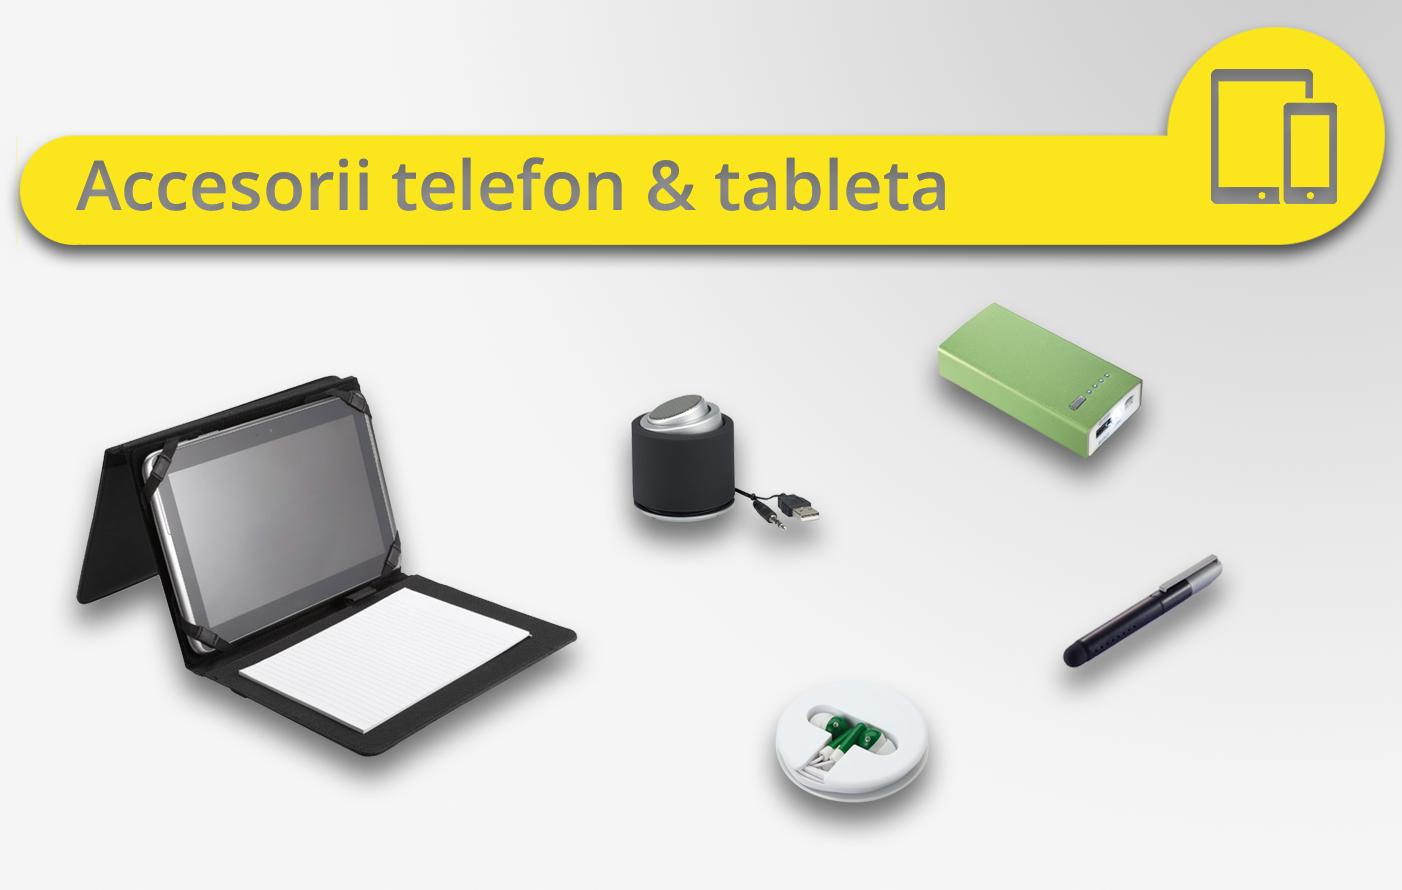 Accesorii Telefon & Tableta